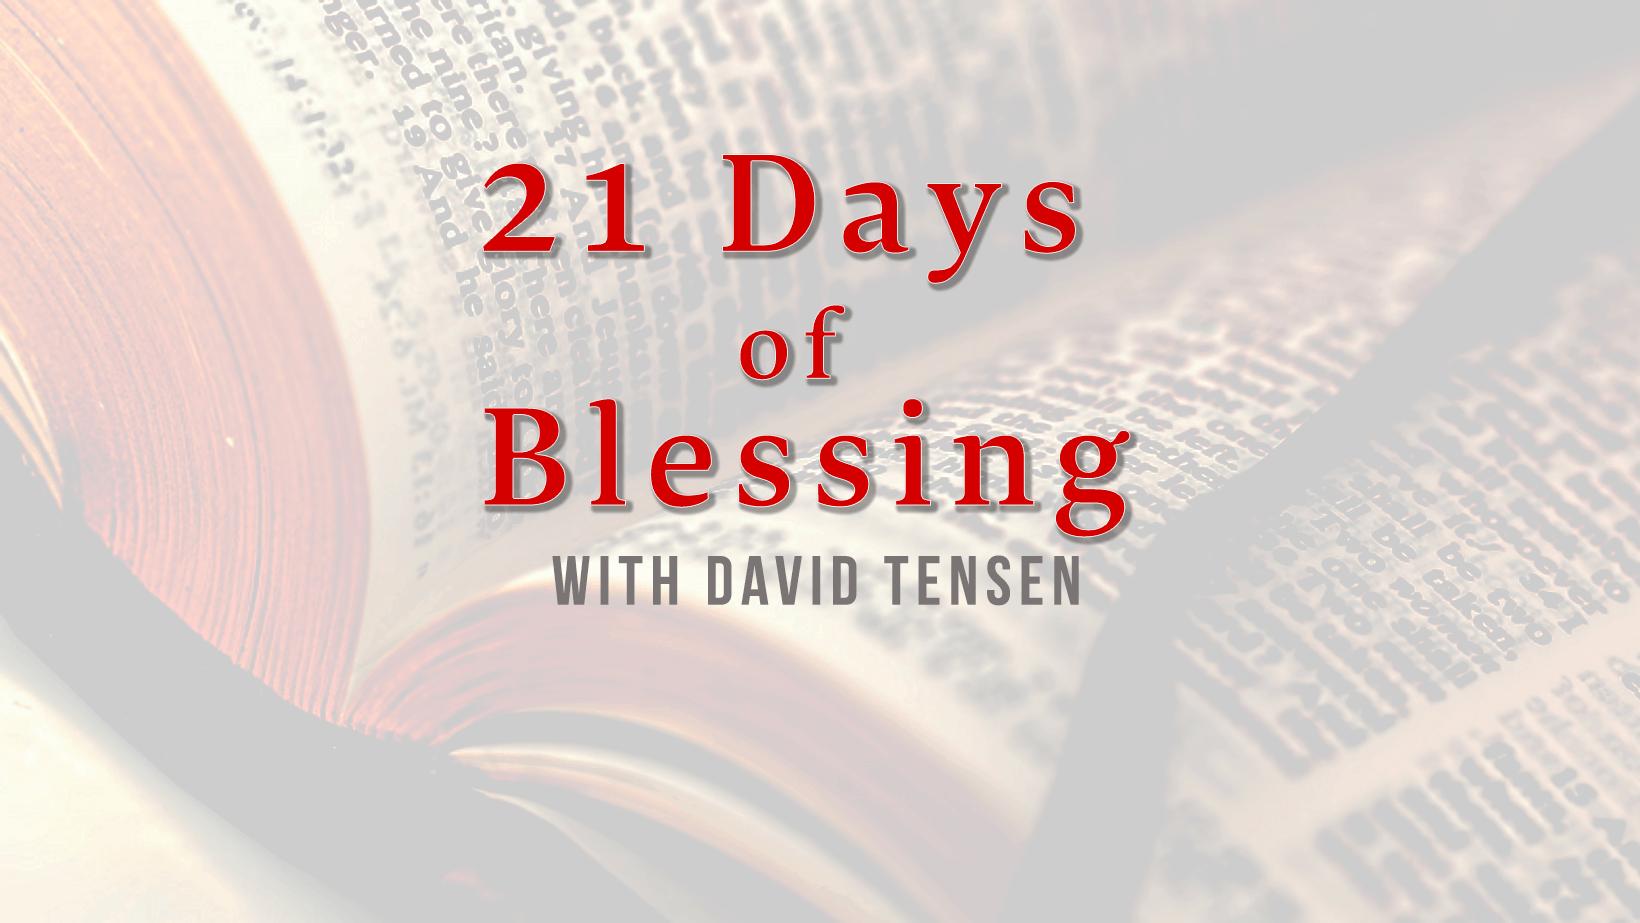 New Years Blessing – 21 Days of Blessing – davidtensen.com